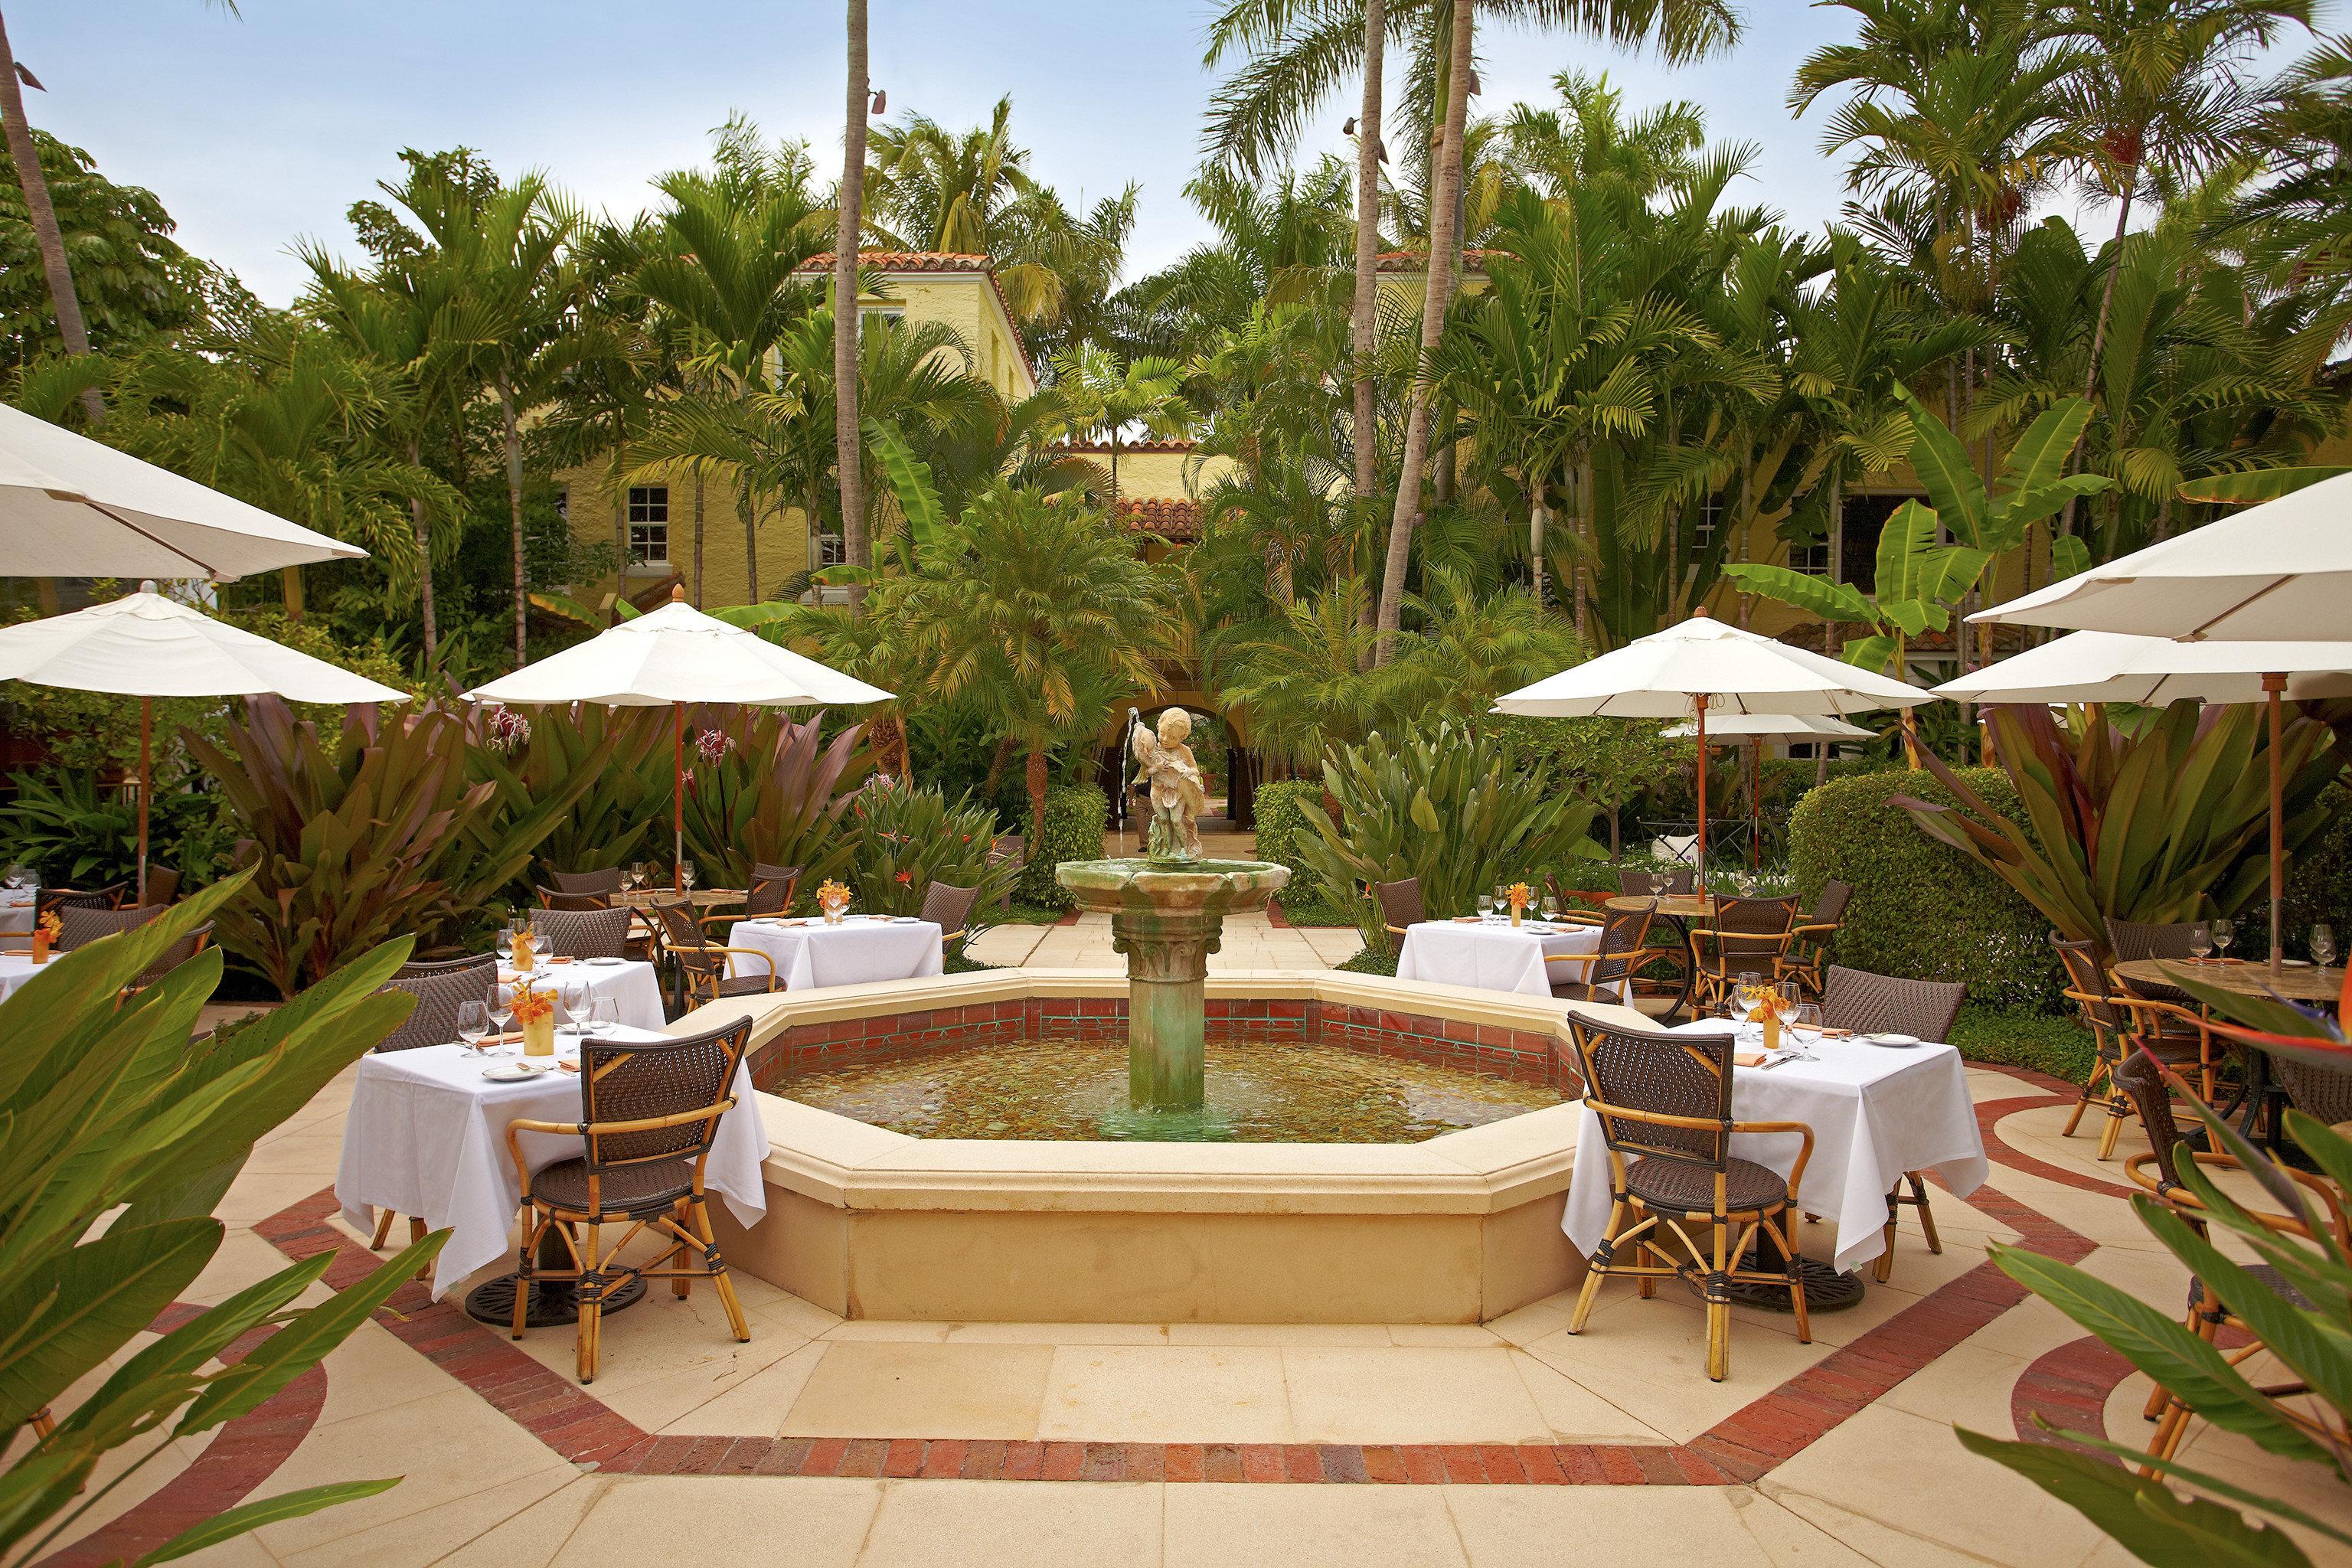 Architecture Buildings Elegant Exterior Luxury tree property Resort swimming pool home Villa arecales hacienda backyard caribbean Garden set